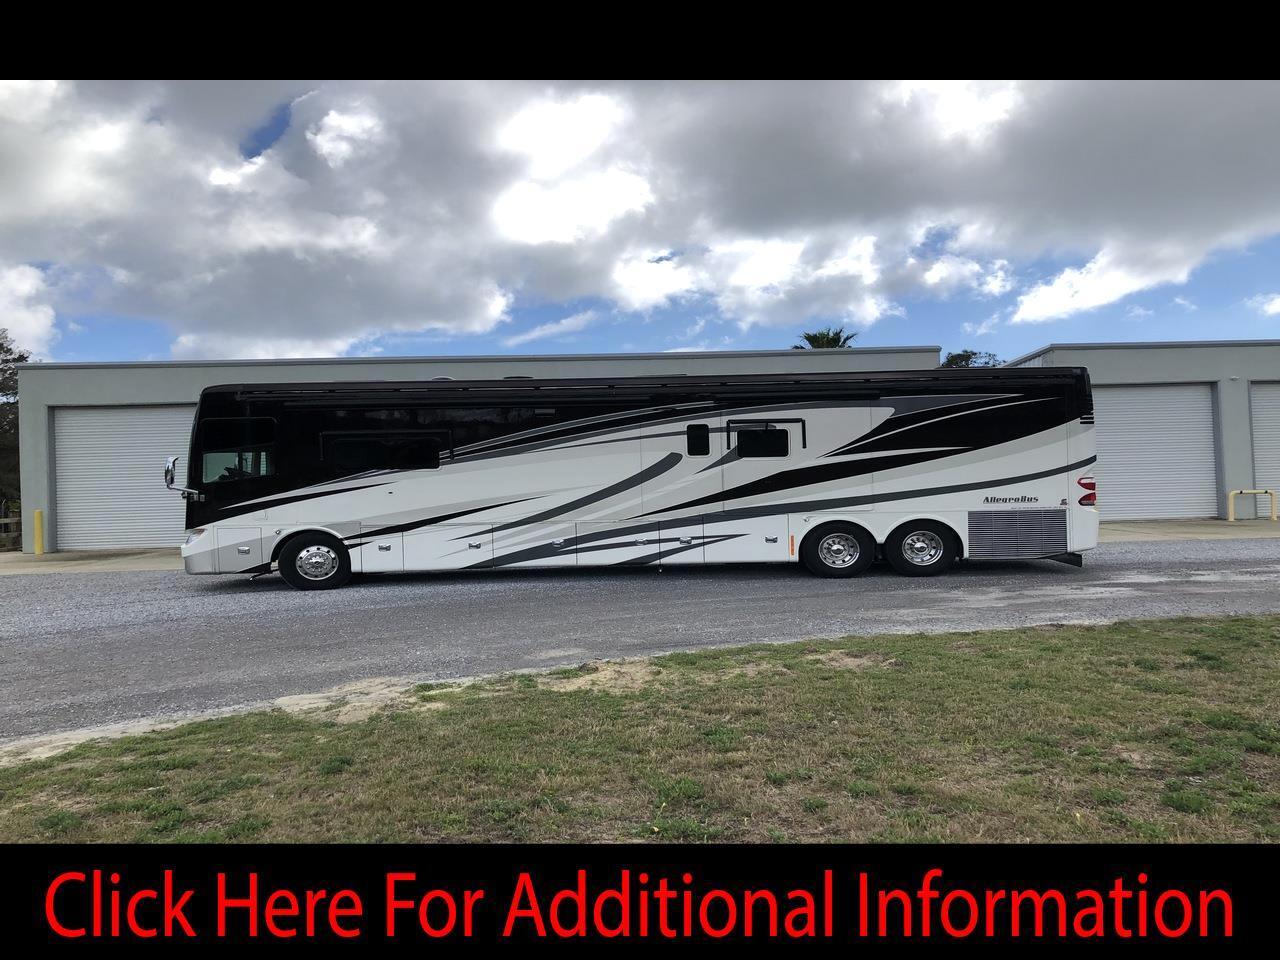 2015 Tiffin Motorhomes Allegro Bus 45LP